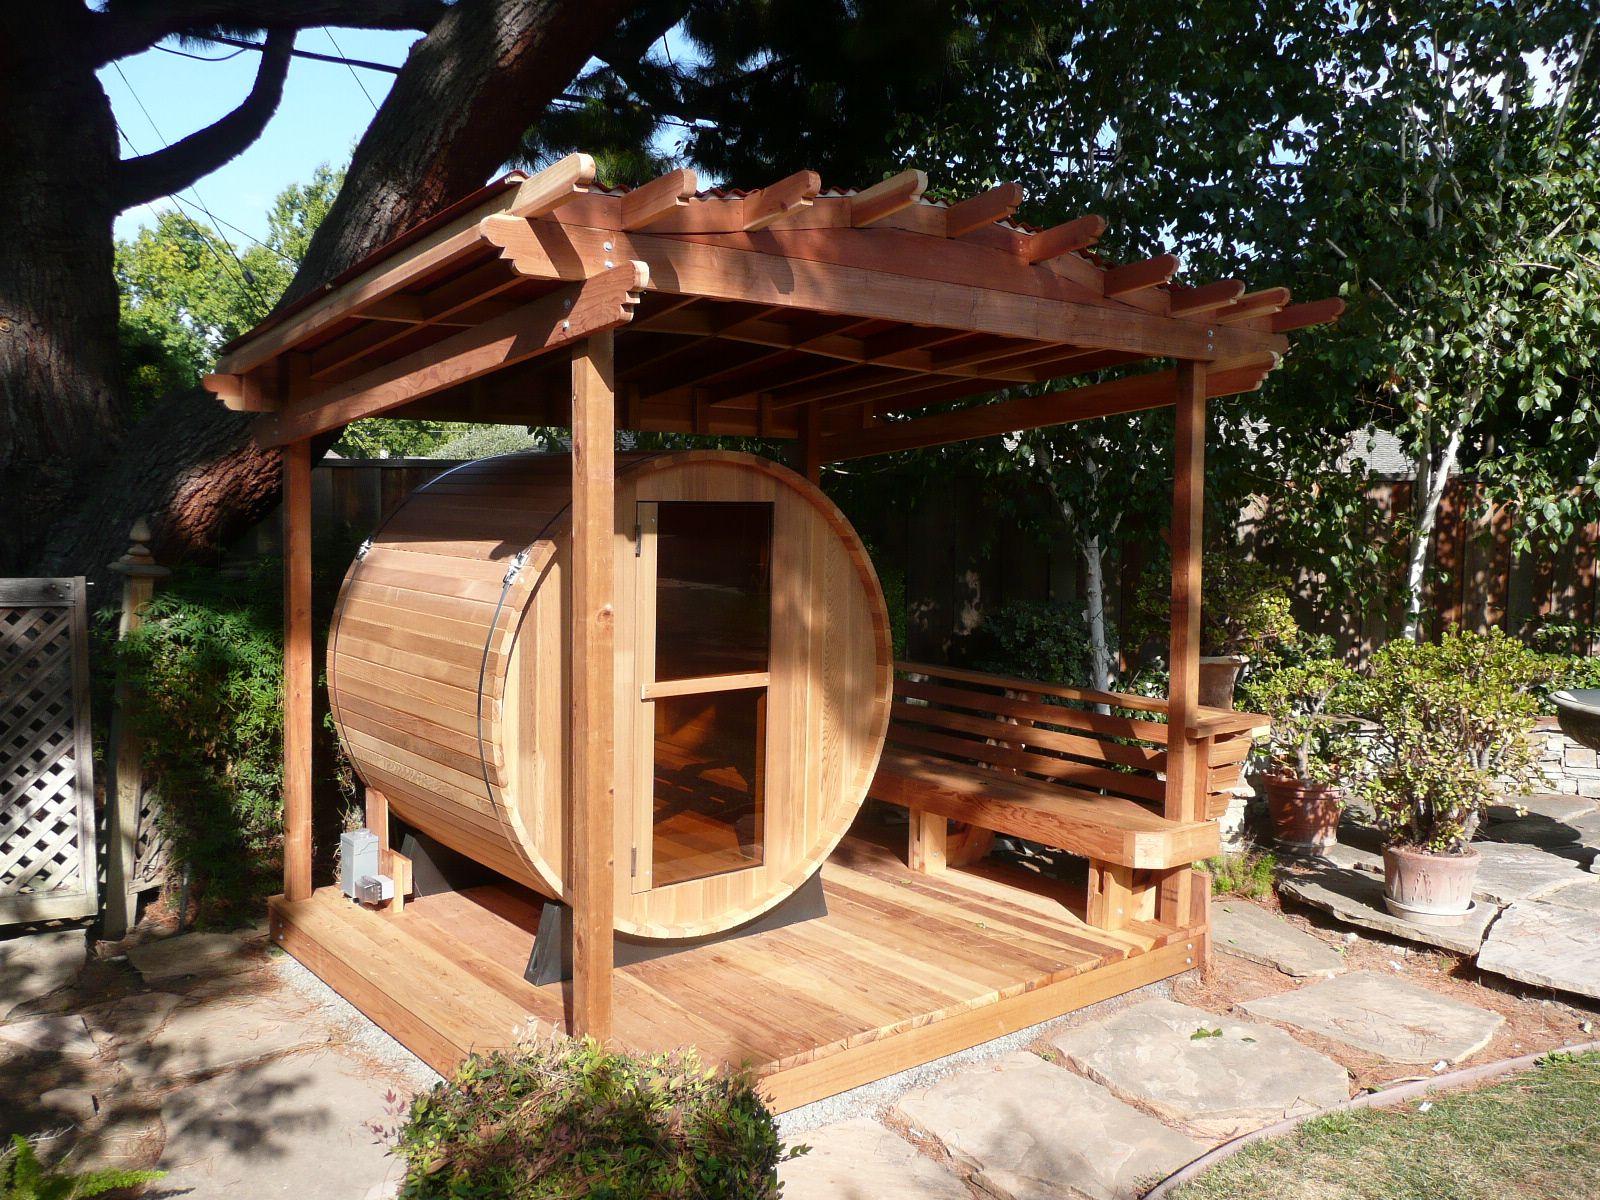 Relaxing Patio Barrel Sauna Hot Tubs Saunas Backyard diy sweat lodge